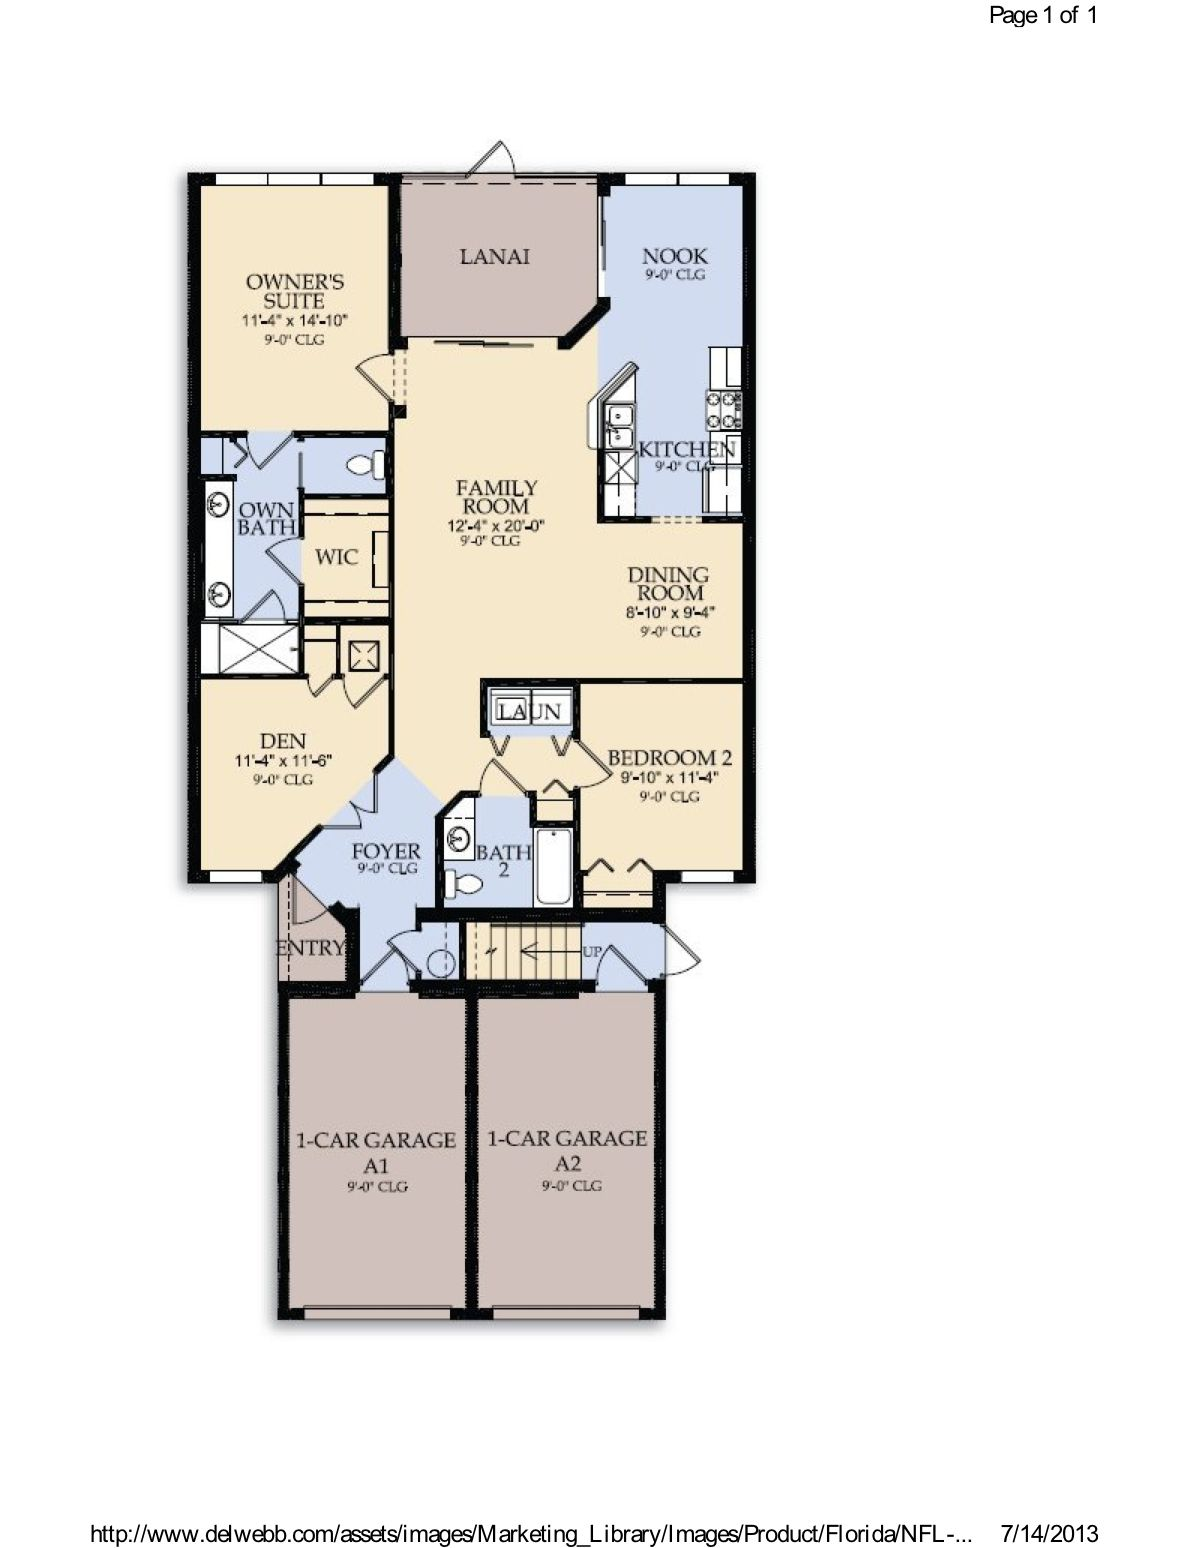 ce51d2d376406c122b756aa4d27cf880 - Merrill Gardens Champions Gate Floor Plans